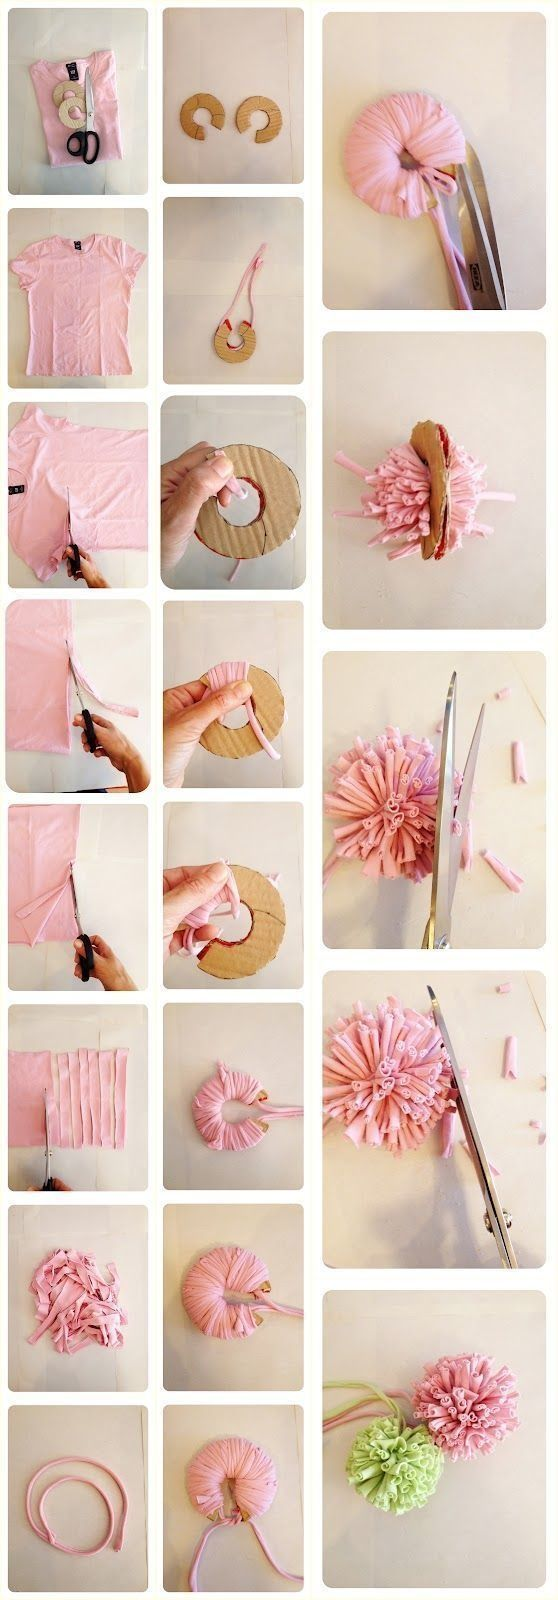 Make some cute pom-poms.